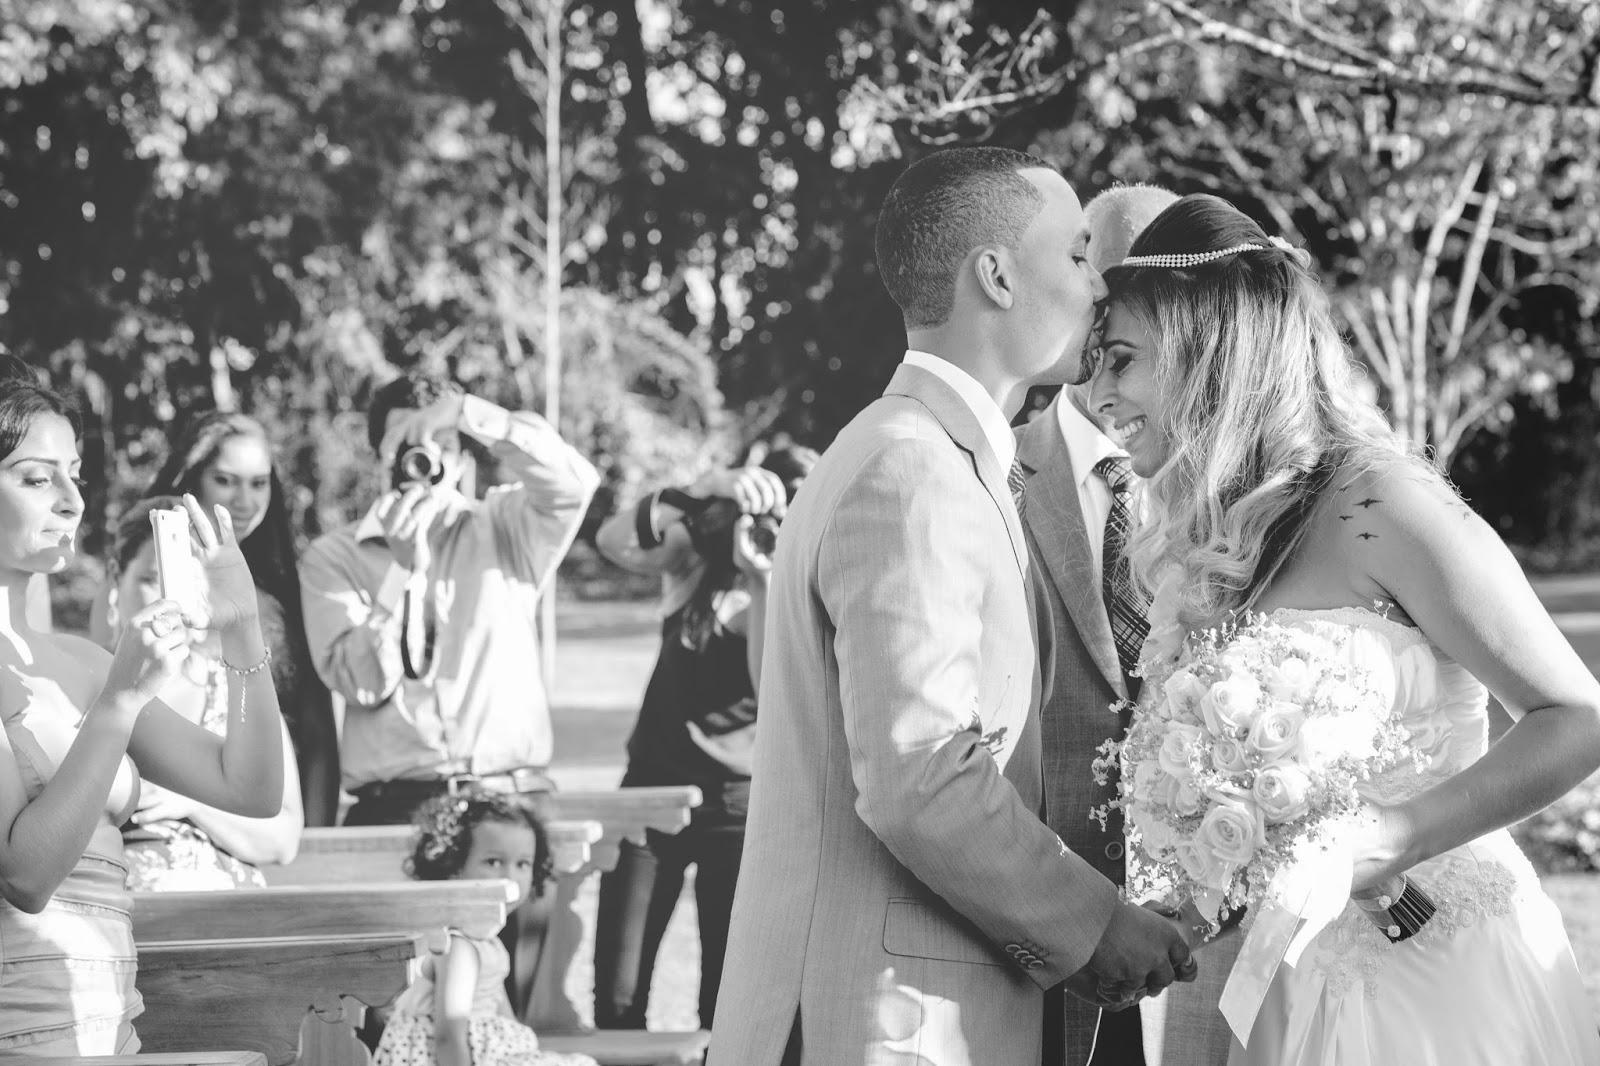 entrada noiva - noiva - noivo - casamento de dia - casamento ao ar livre